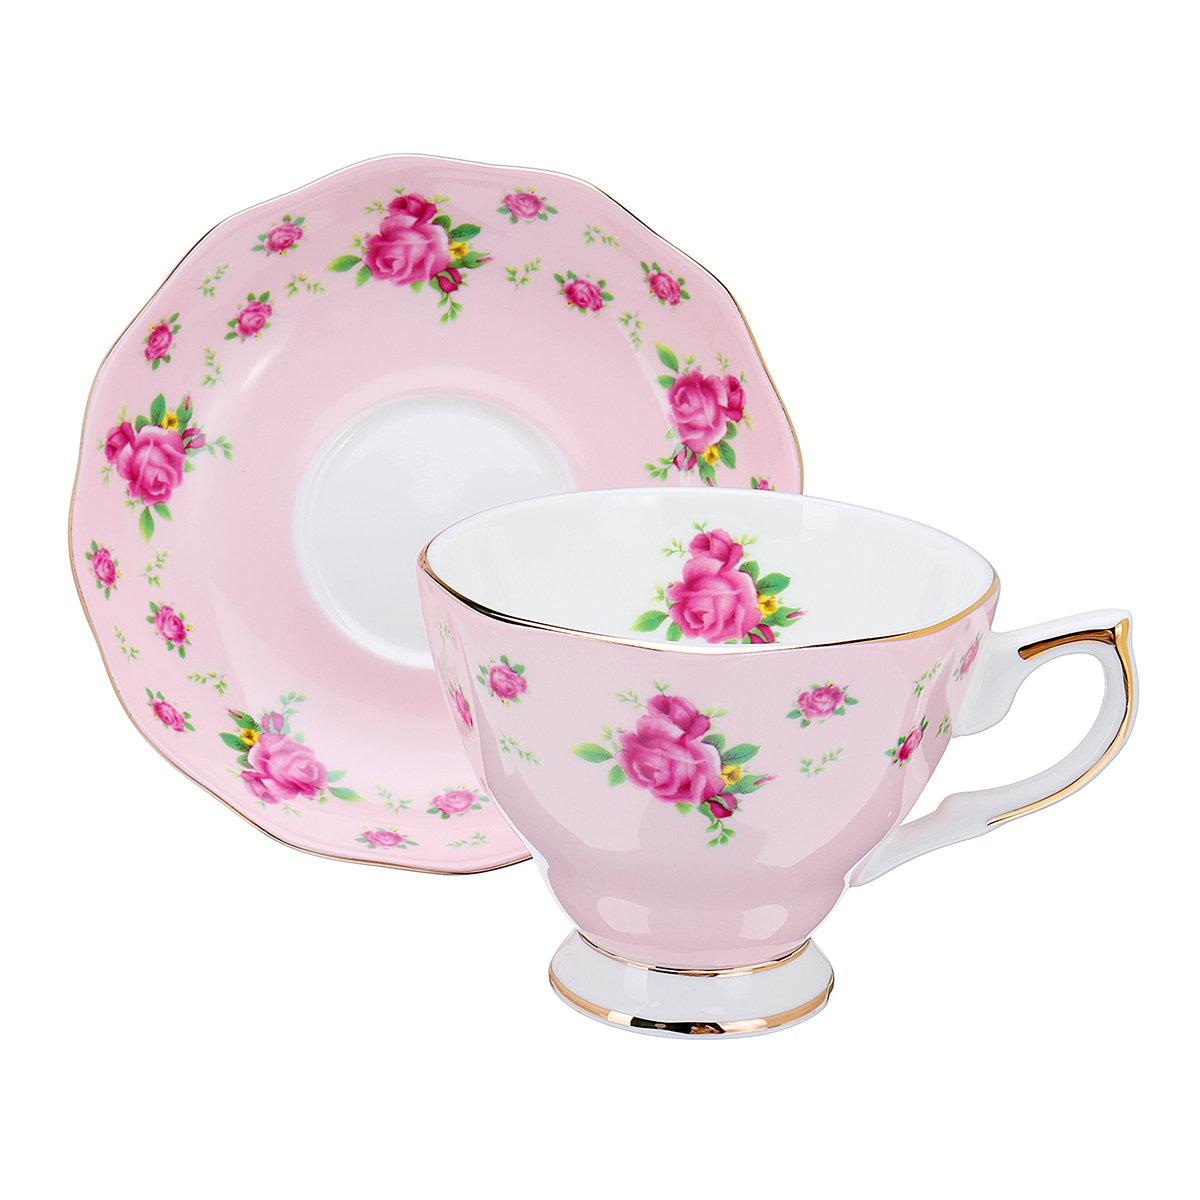 Porcelain Fashion British Bone China Coffee Cup Saucer Ceramic Flower Tea Set